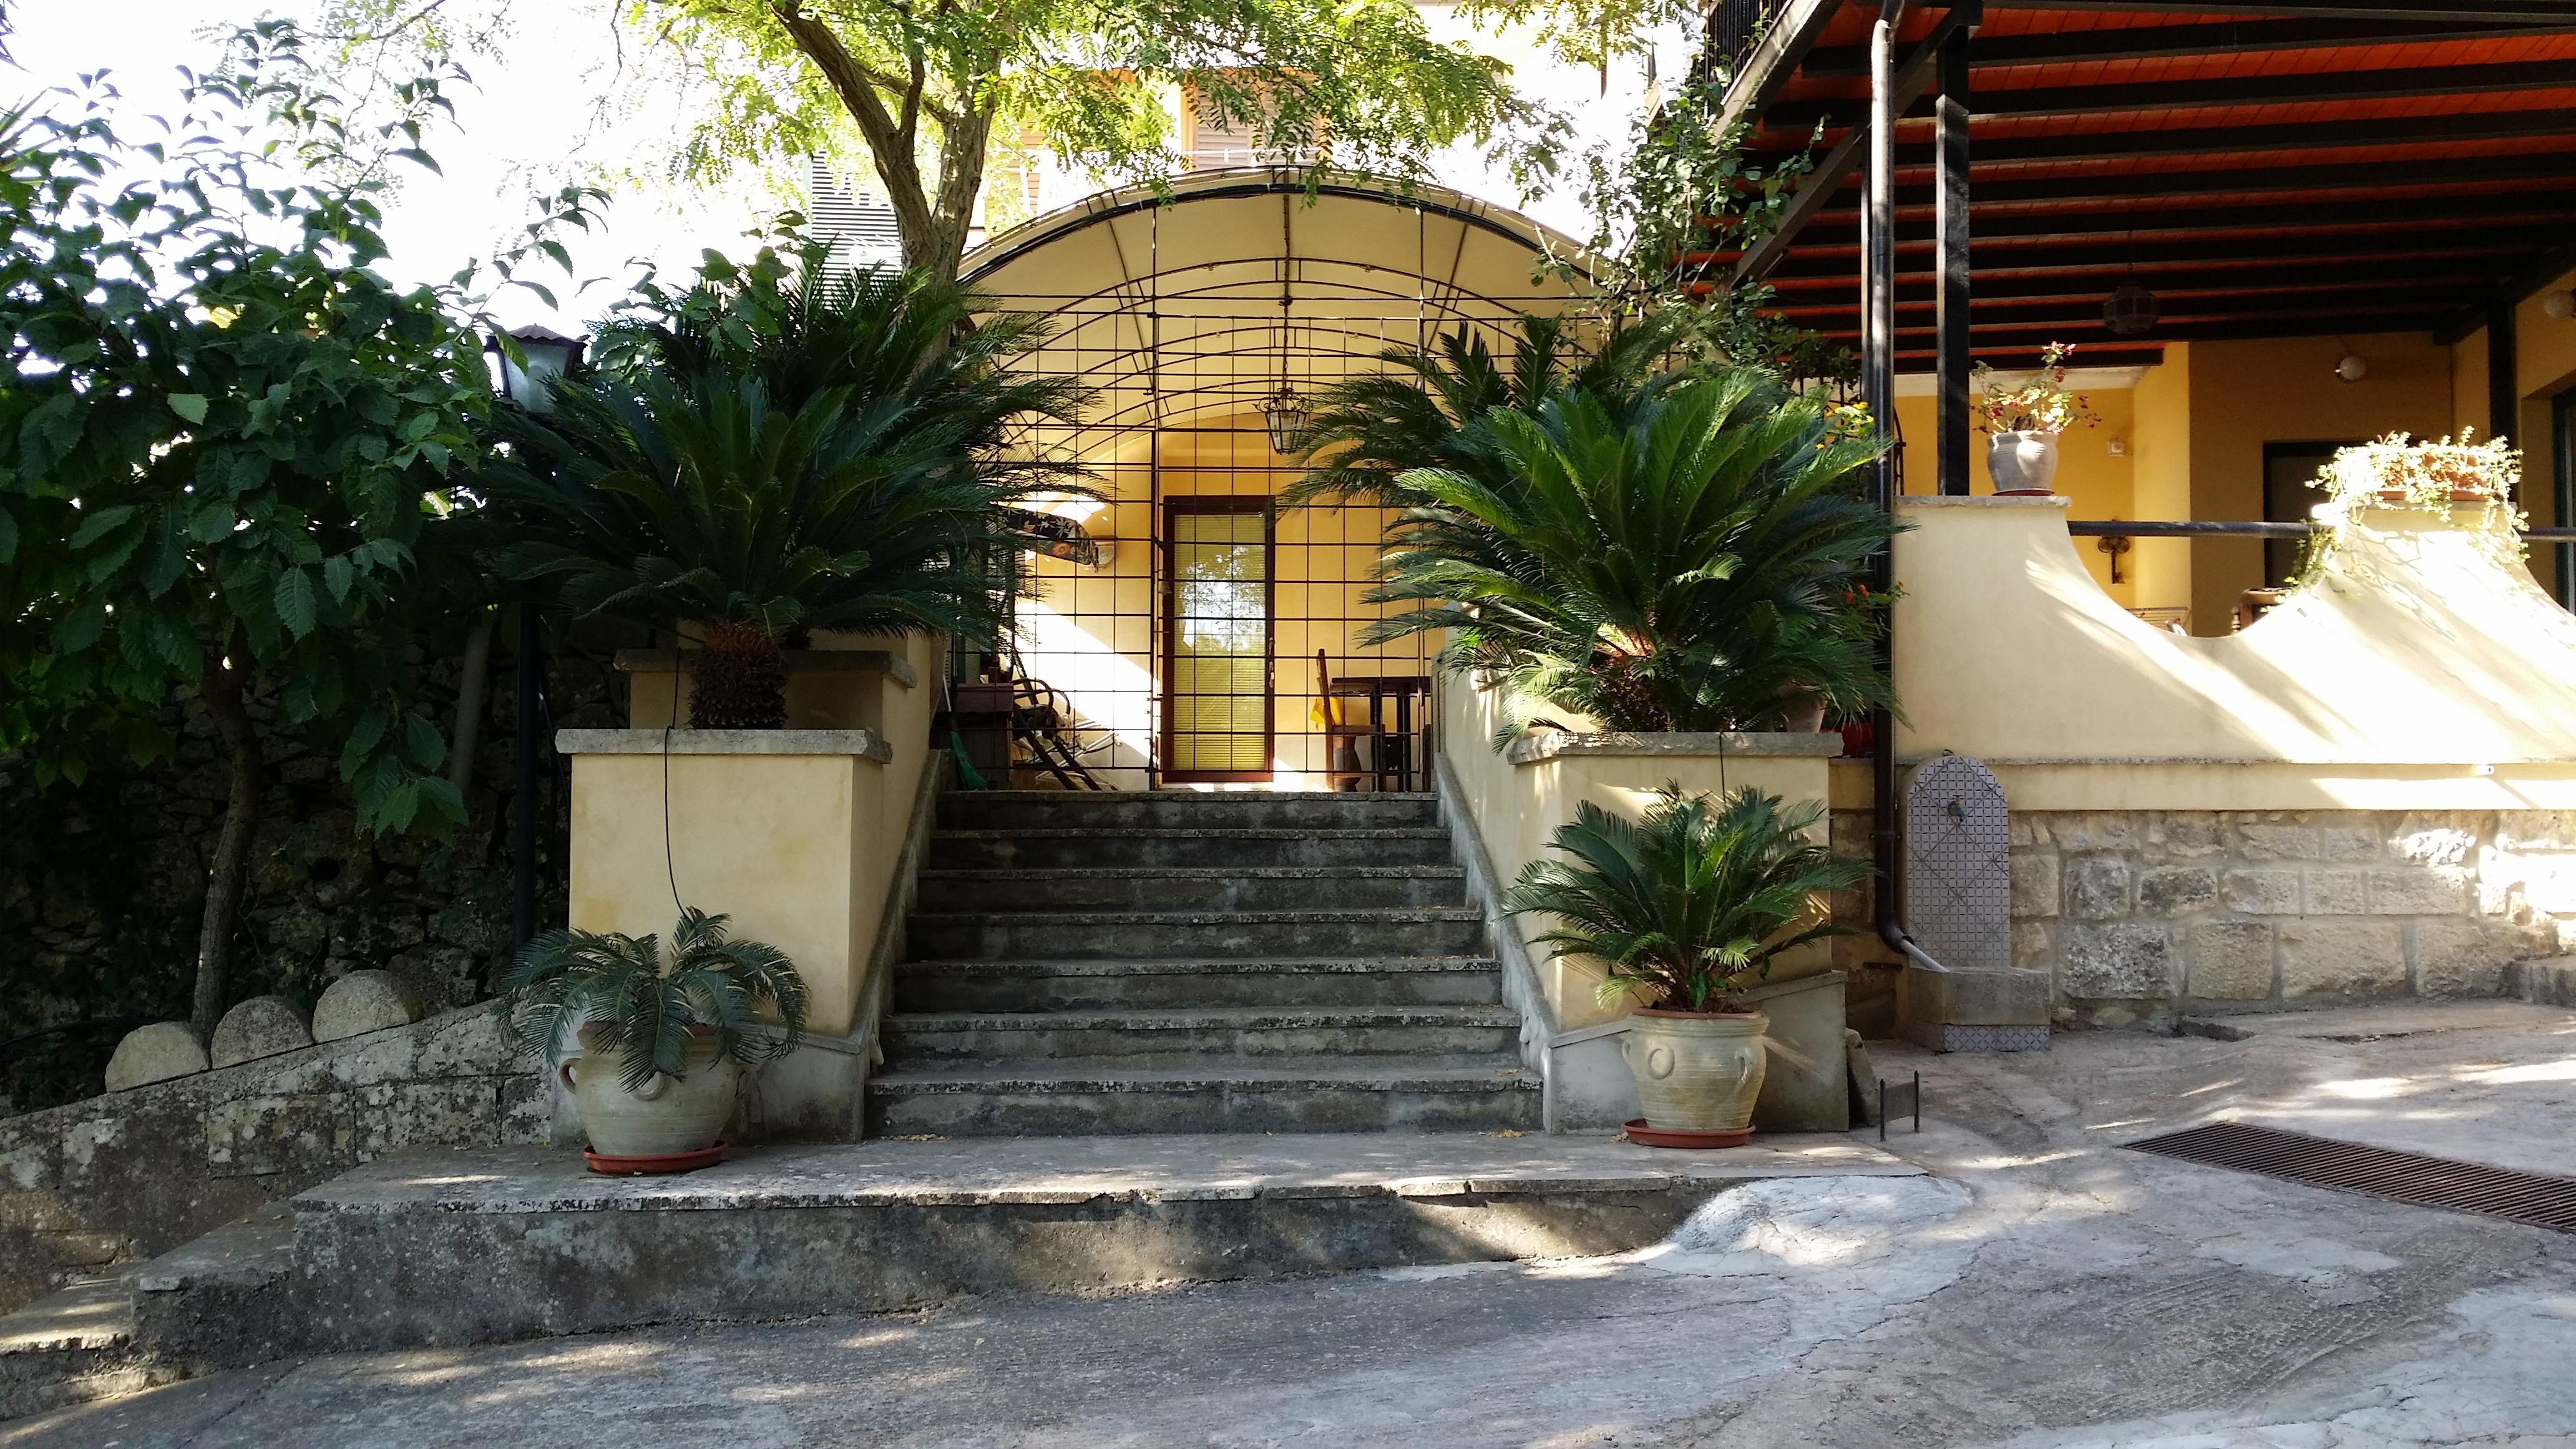 Appartement de vacances Carrubo (1730191), Modica, Ragusa, Sicile, Italie, image 19